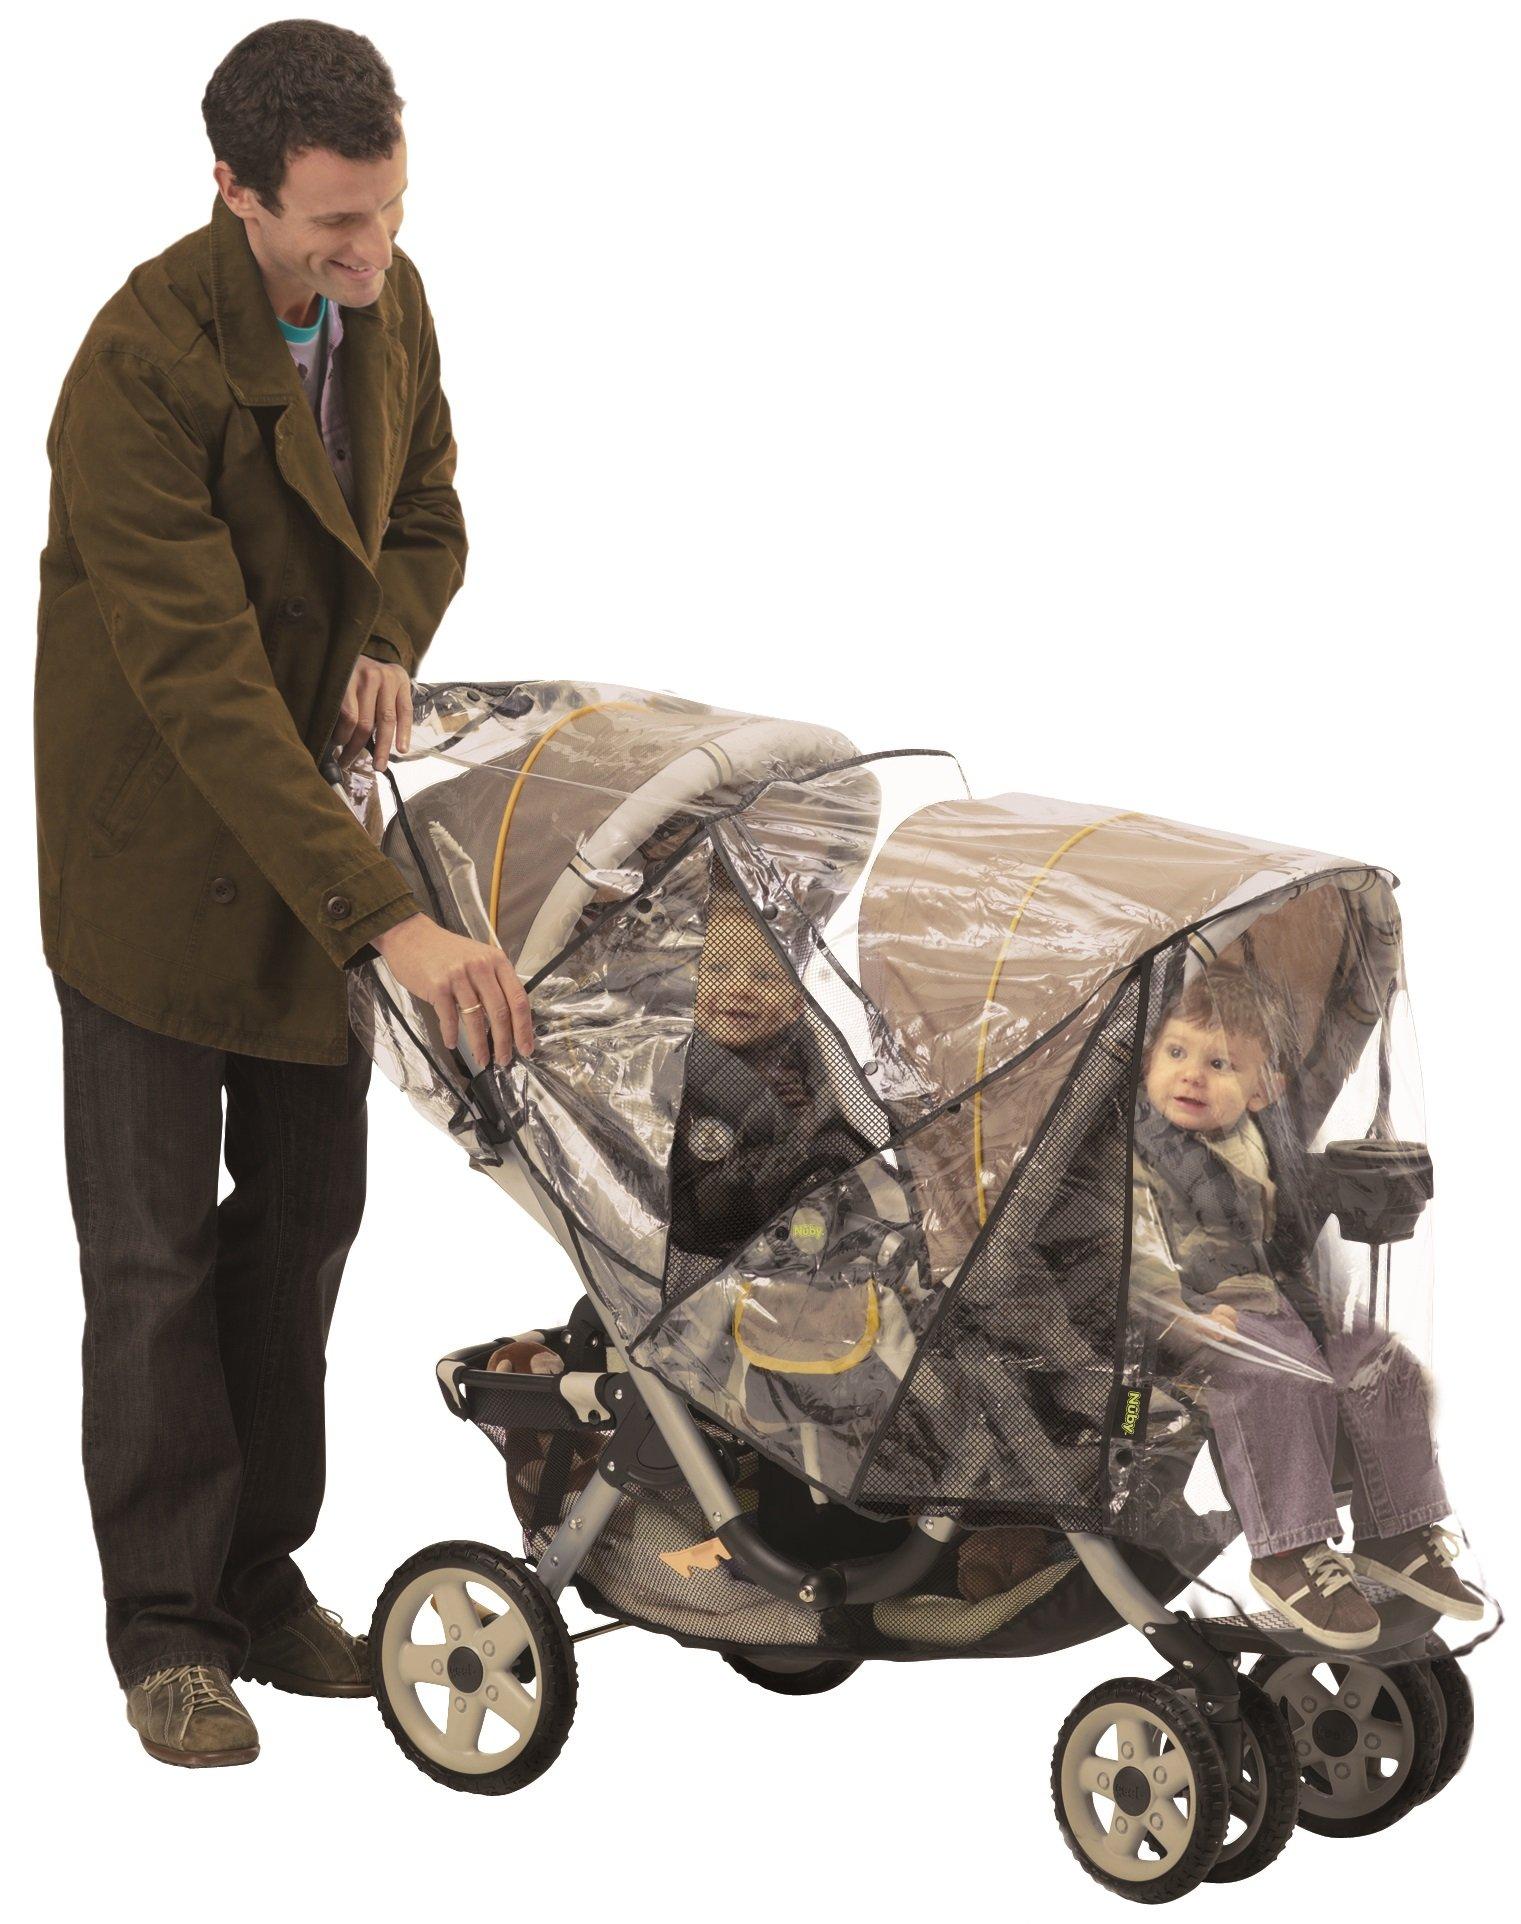 NUBY Deluxe Double Stroller Rain Cover, Tandem Stroller Rain Cover, Baby Rain Cover, Double Stroller Accessories, Tandem Stroller Weather Shield, Waterproof, Windproof, Ventilation, Clear Vinyl